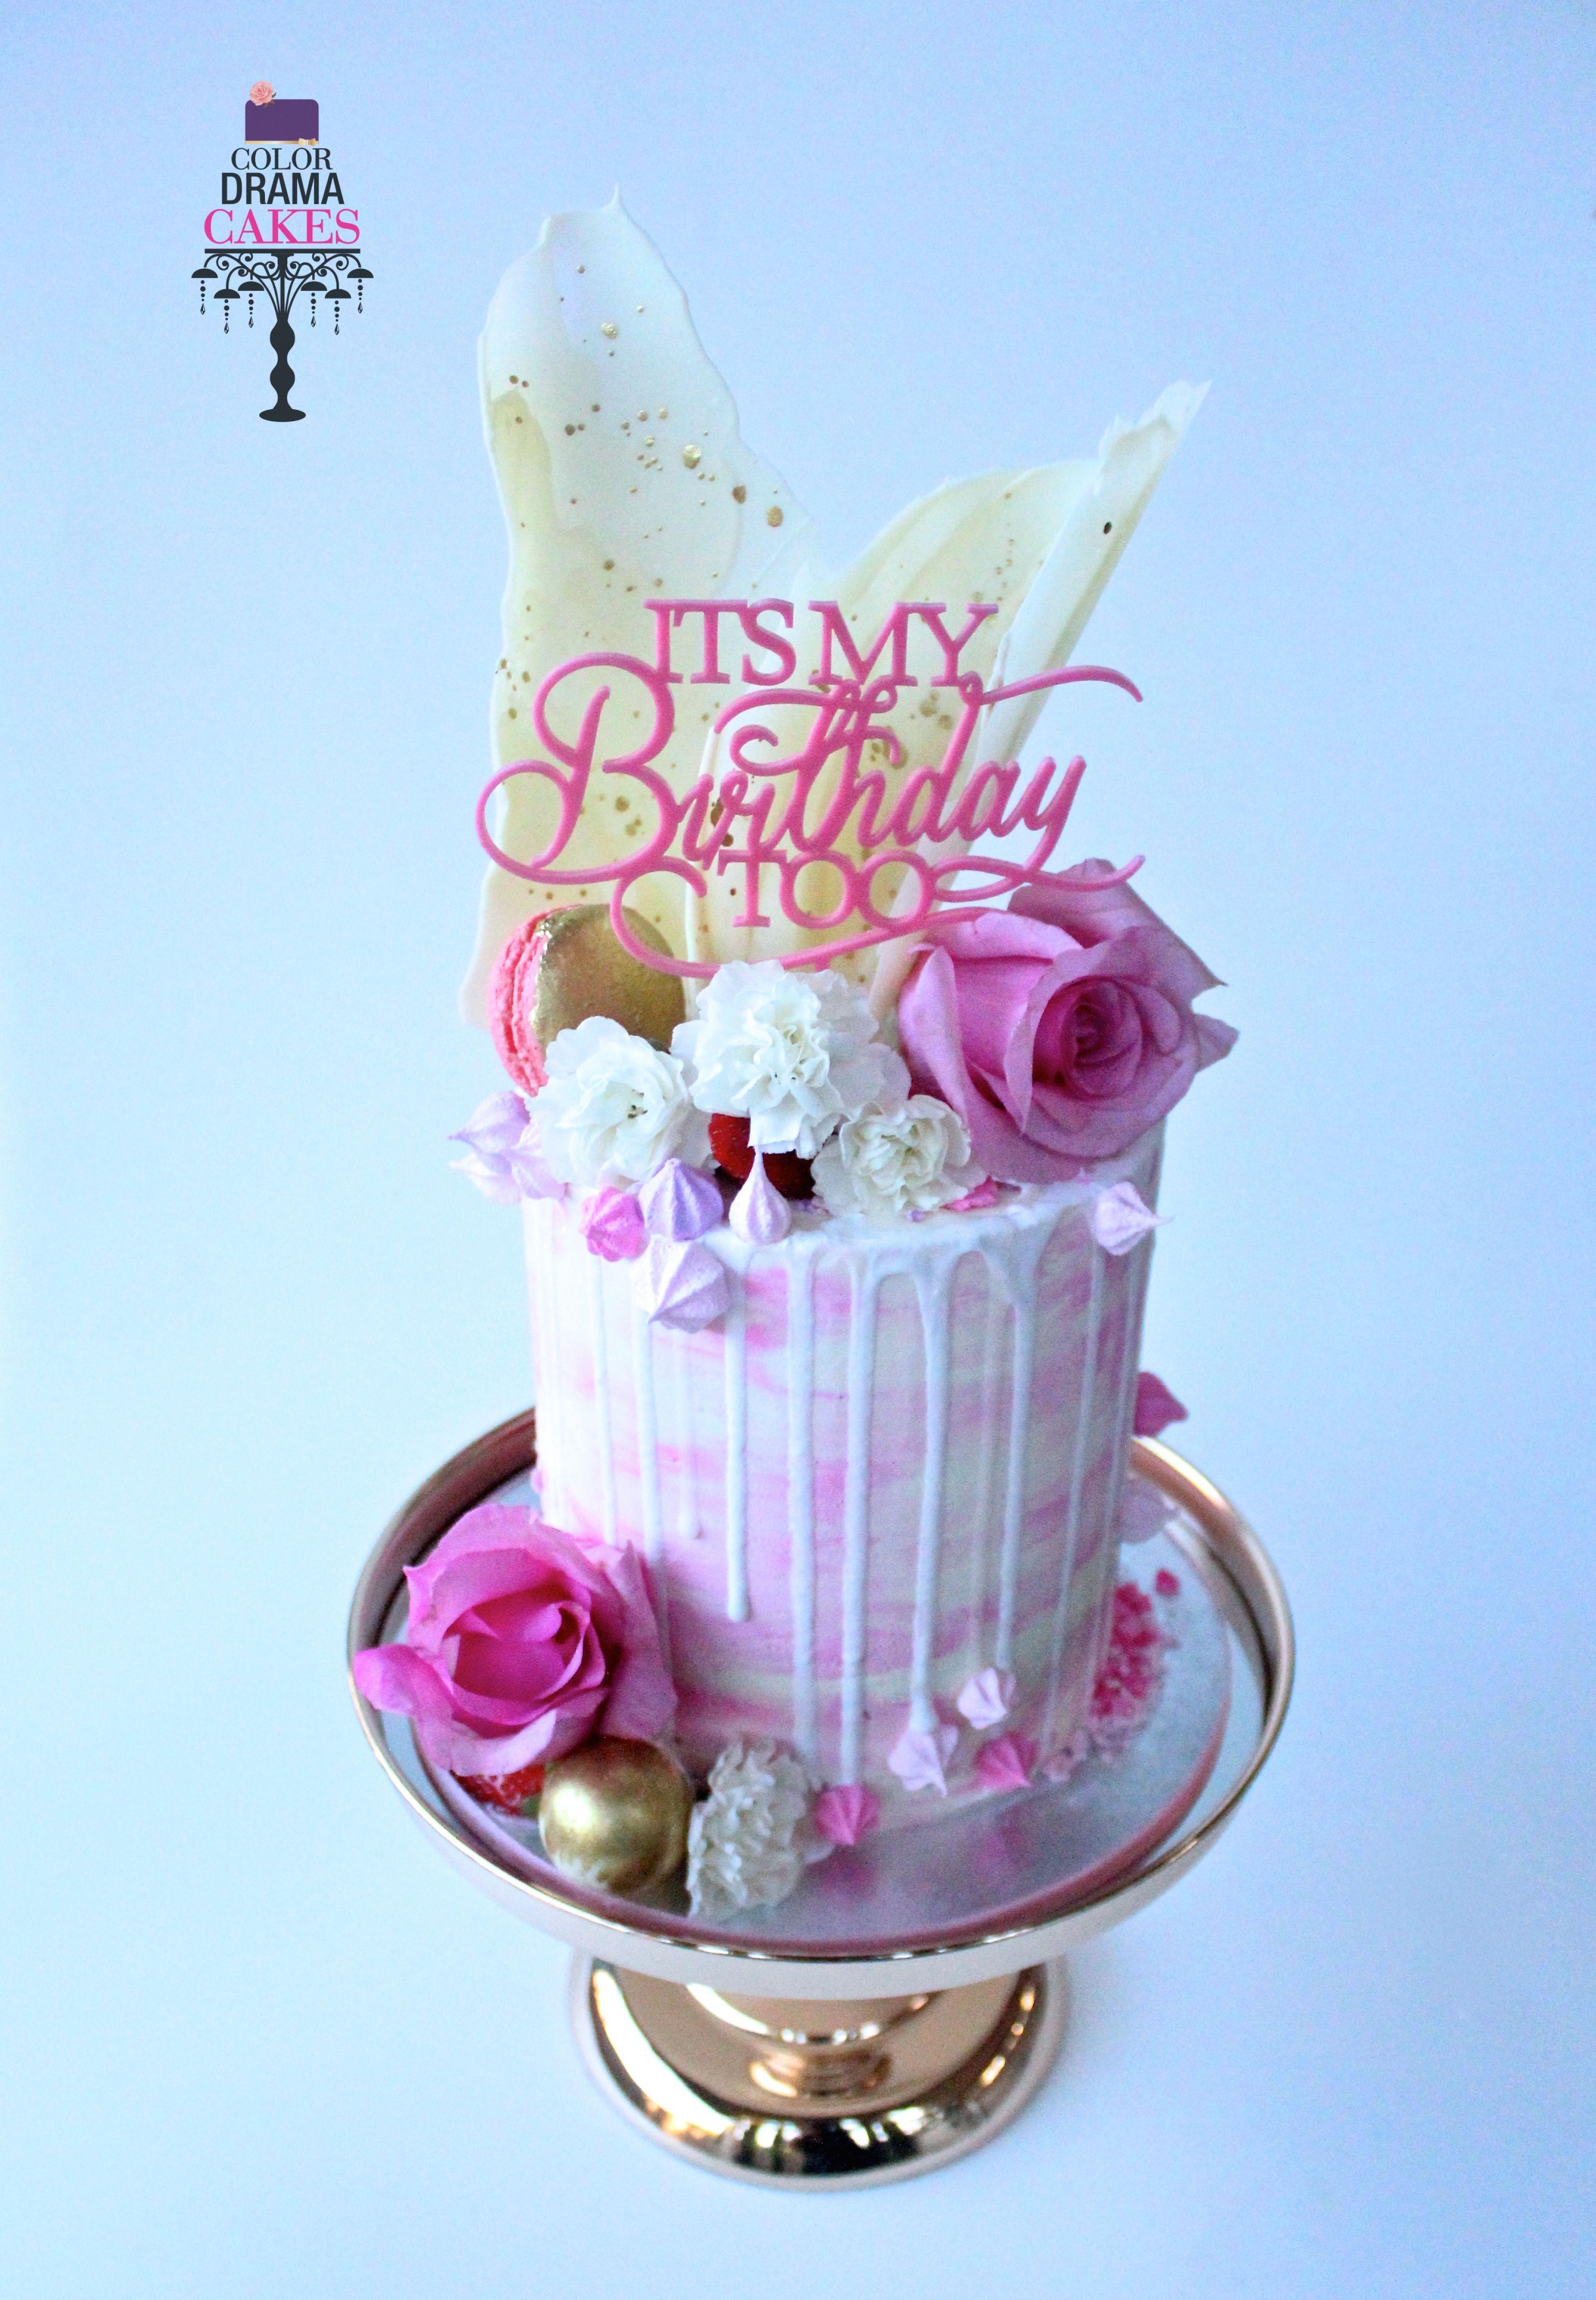 Pink And White Drip Cake Chocolate Shards Fresh Flower Cake The